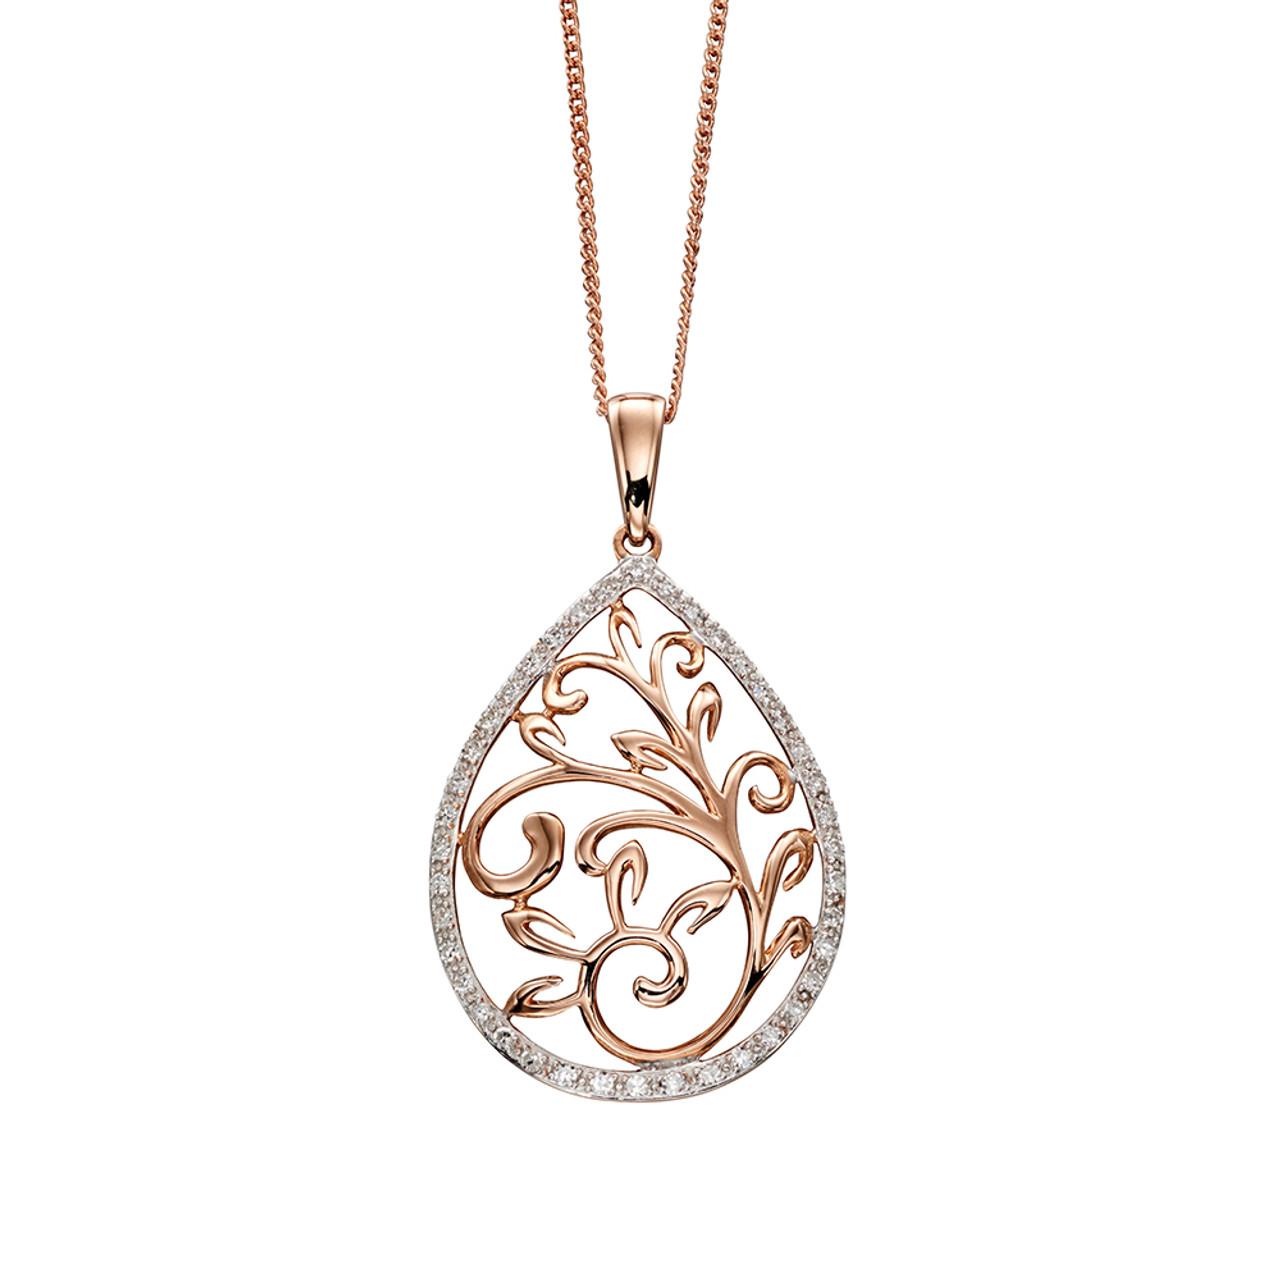 9ct Rose Gold Diamond set pierced Teardrop Pendant on Chain